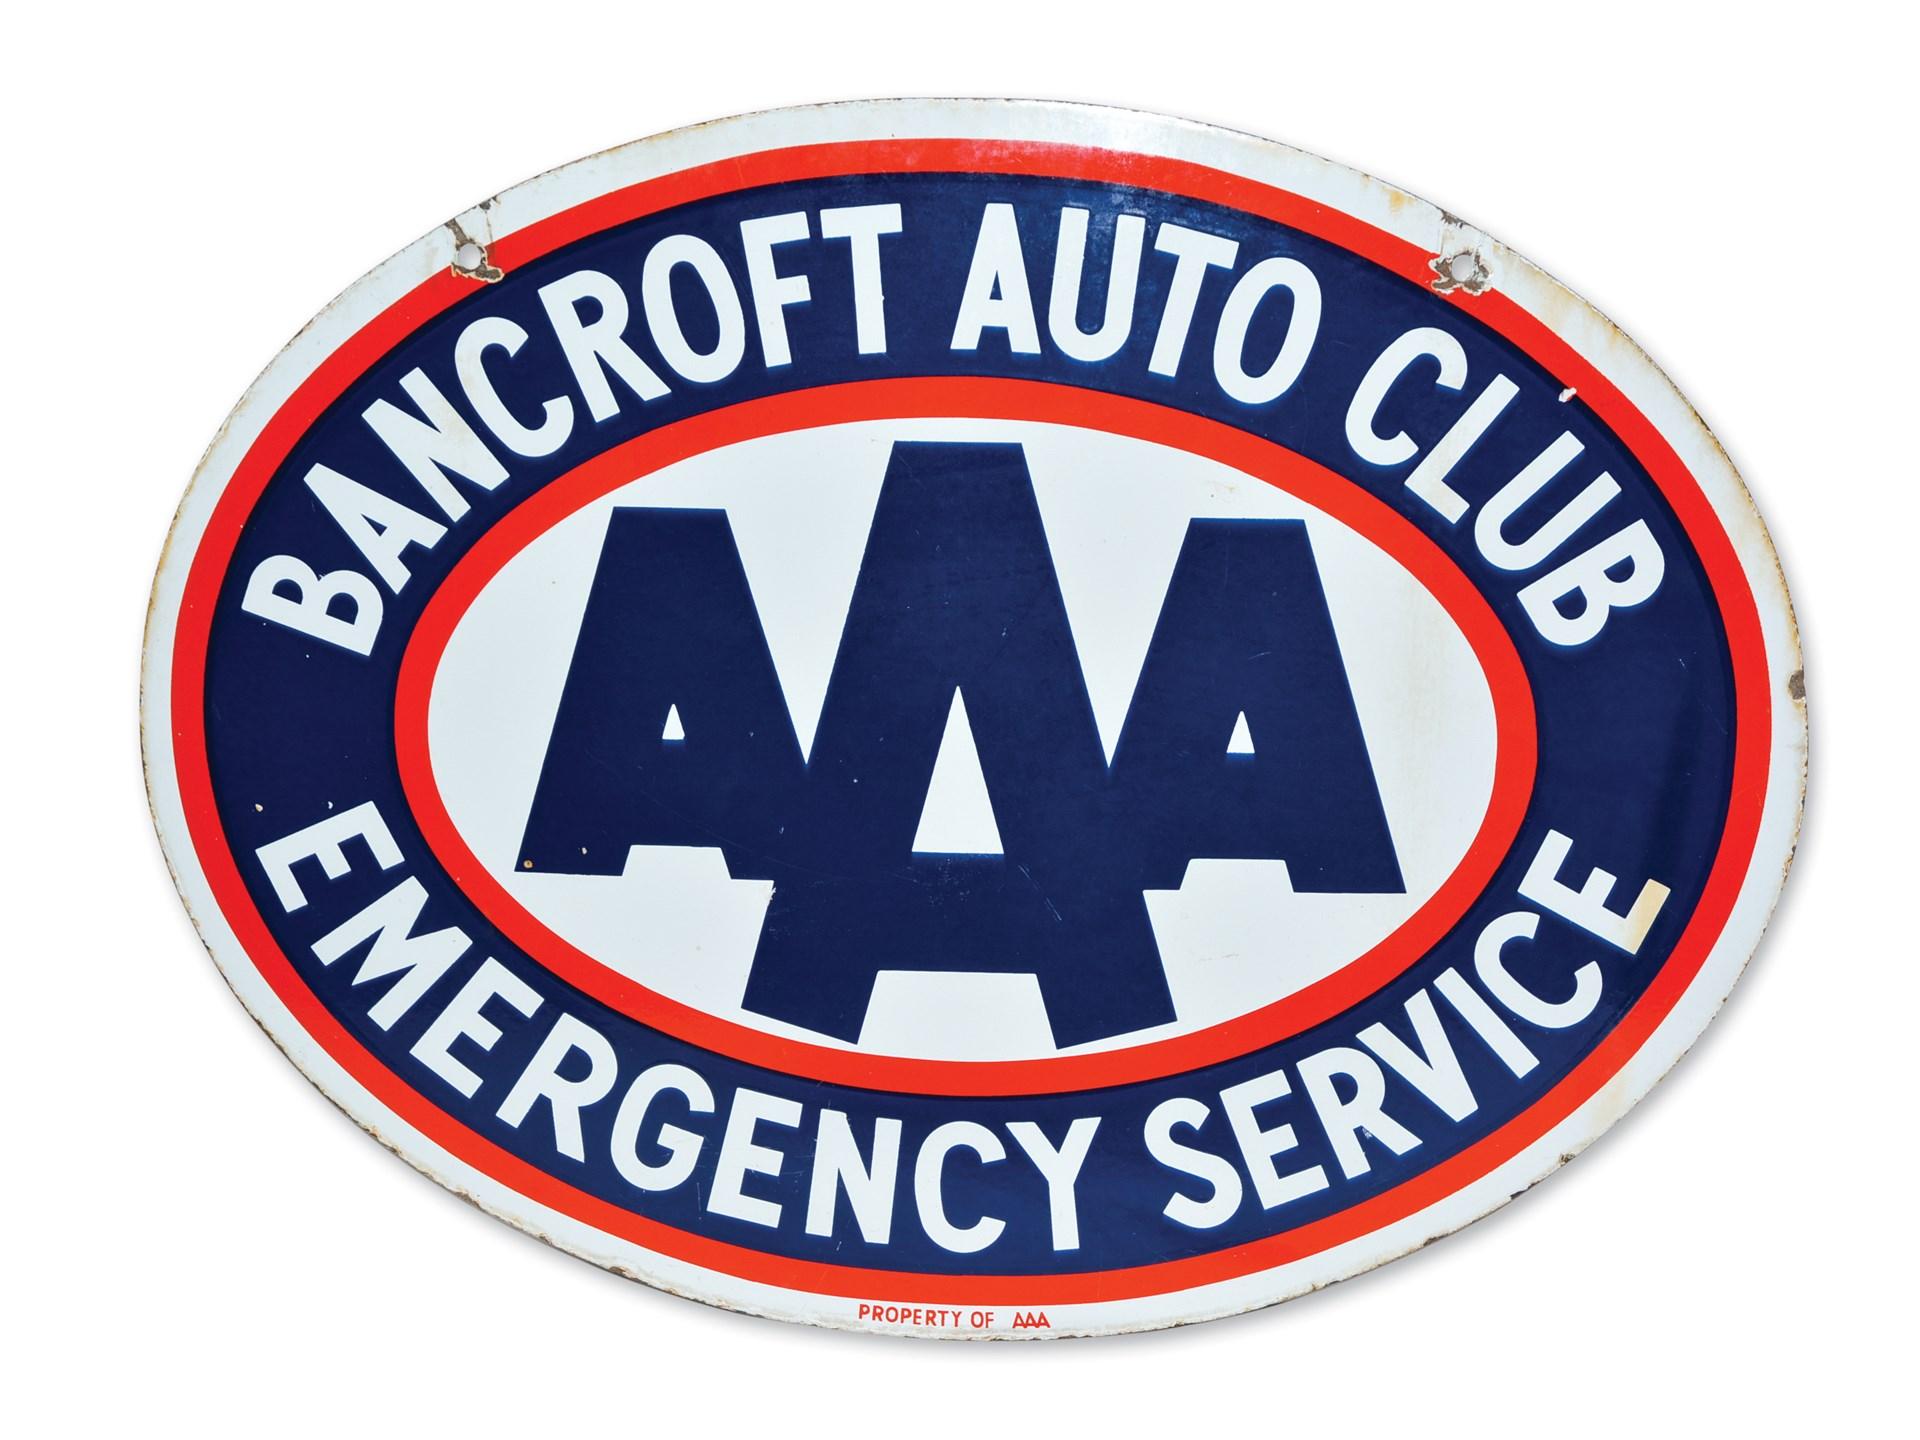 Aaa Auto Club Near Me >> Rm Sotheby S Aaa Bancroft Auto Club Emergency Service Sign